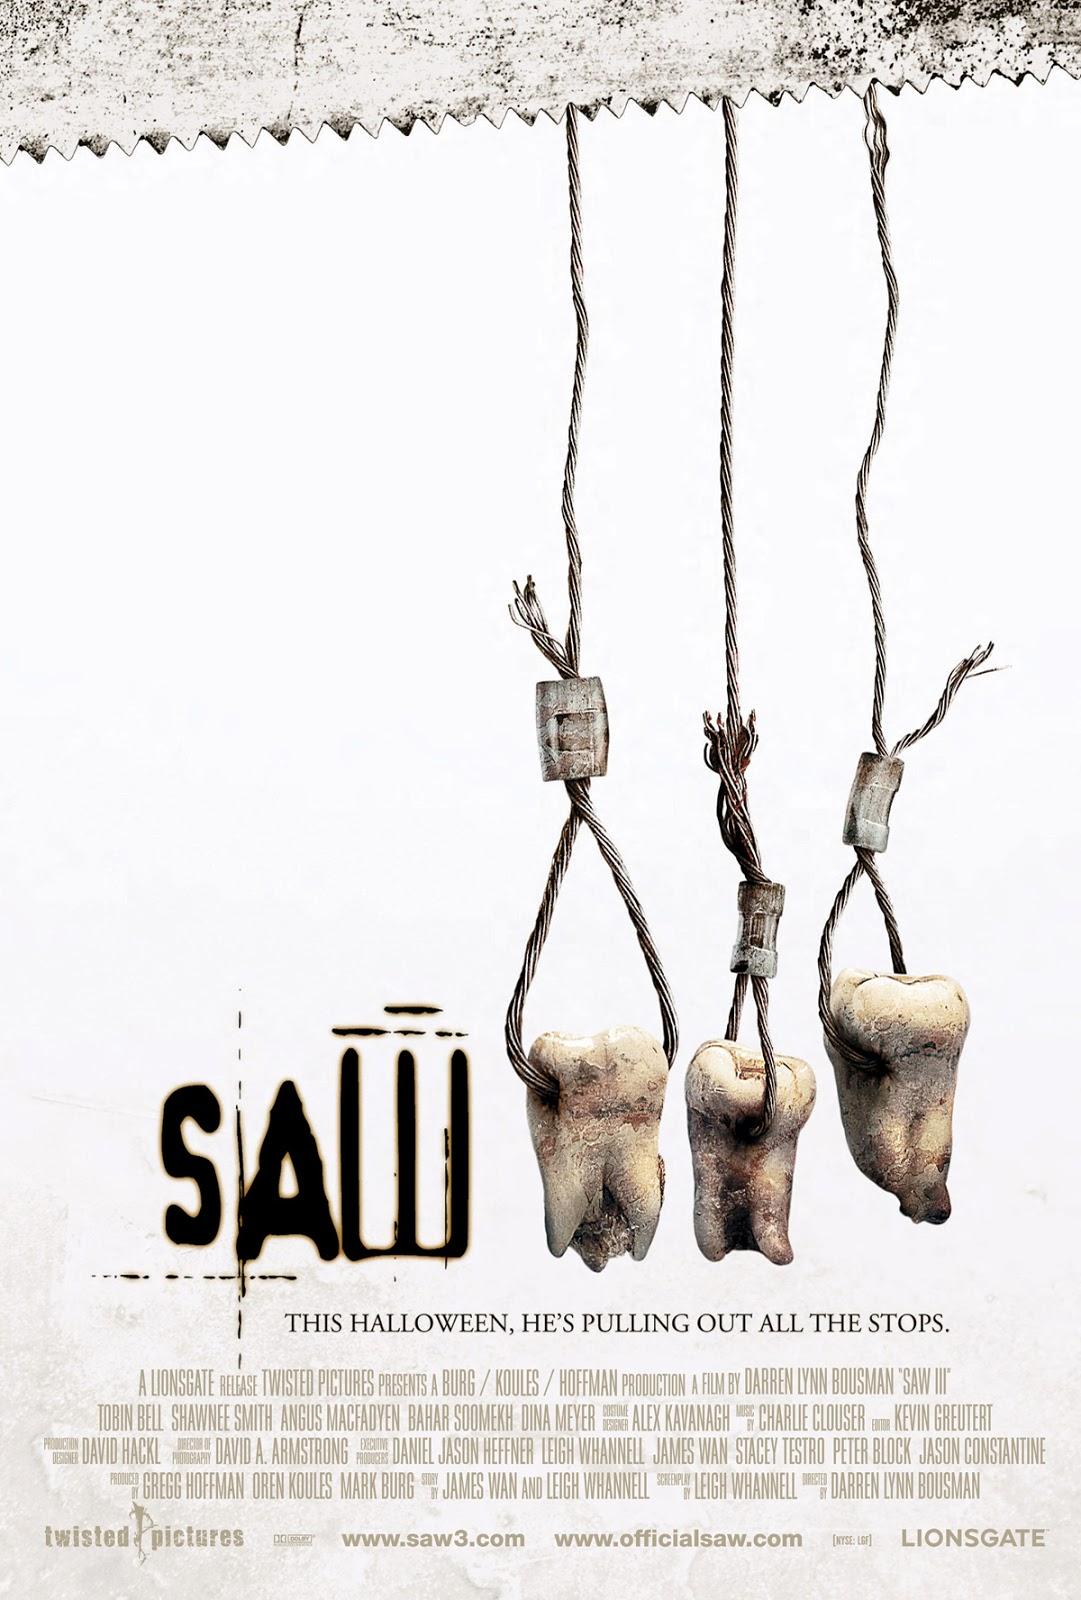 SAW III (2006) Hindi [ORG DD2.0] WEB-DL 1080p 720p 480p x264 | Full Movie